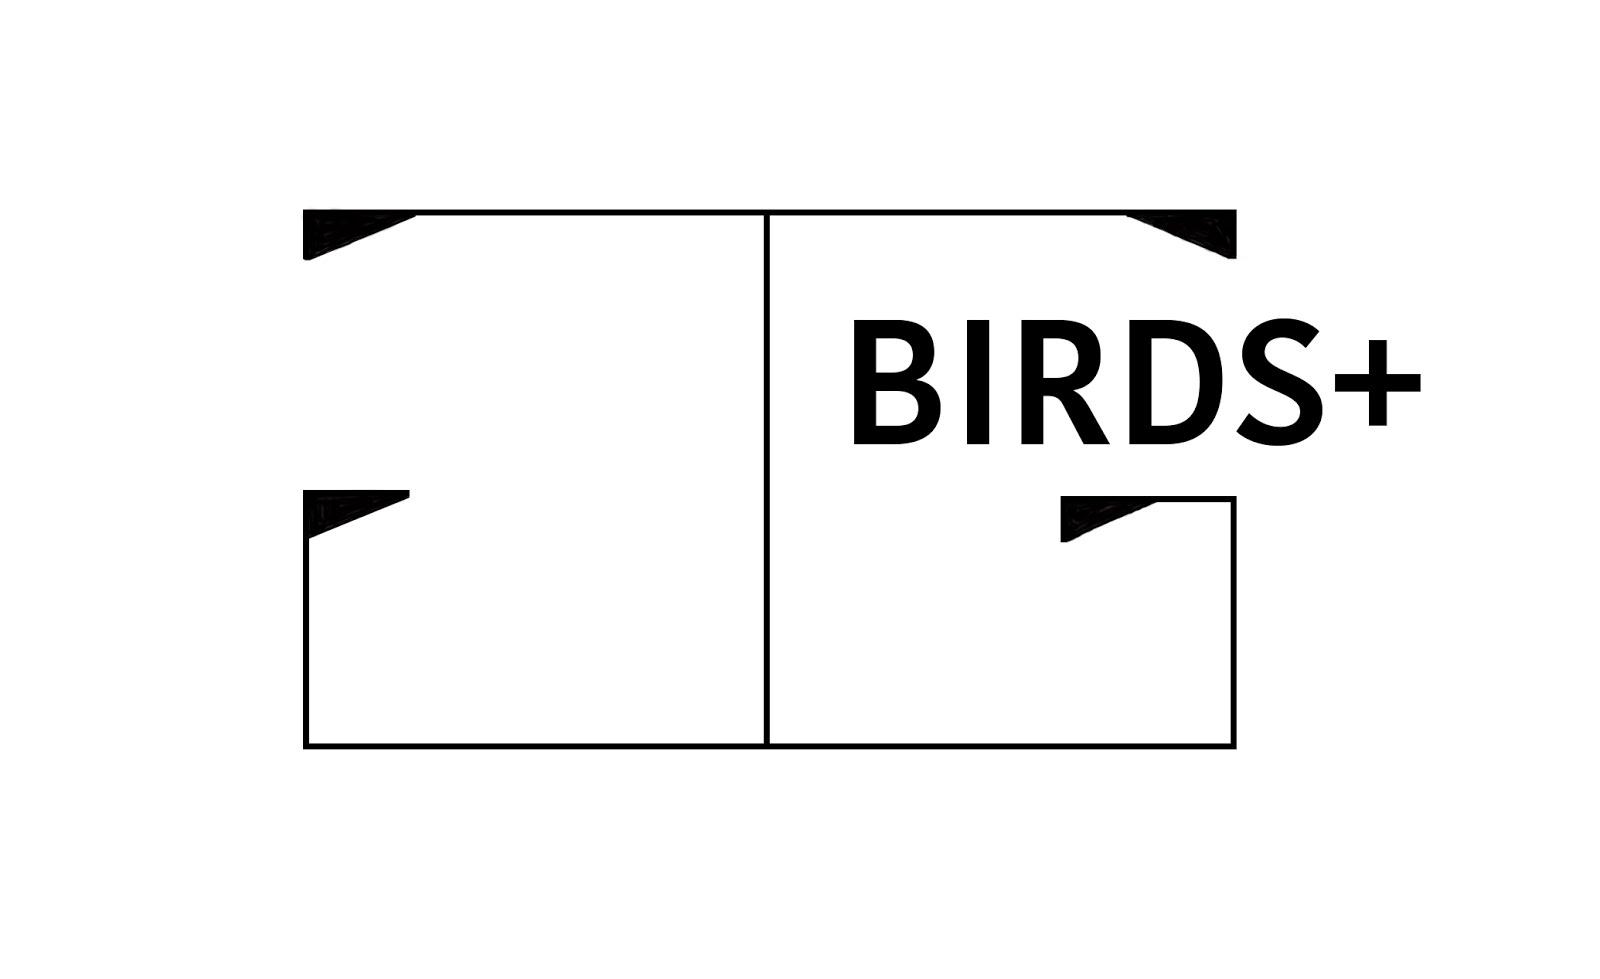 JG Birds+